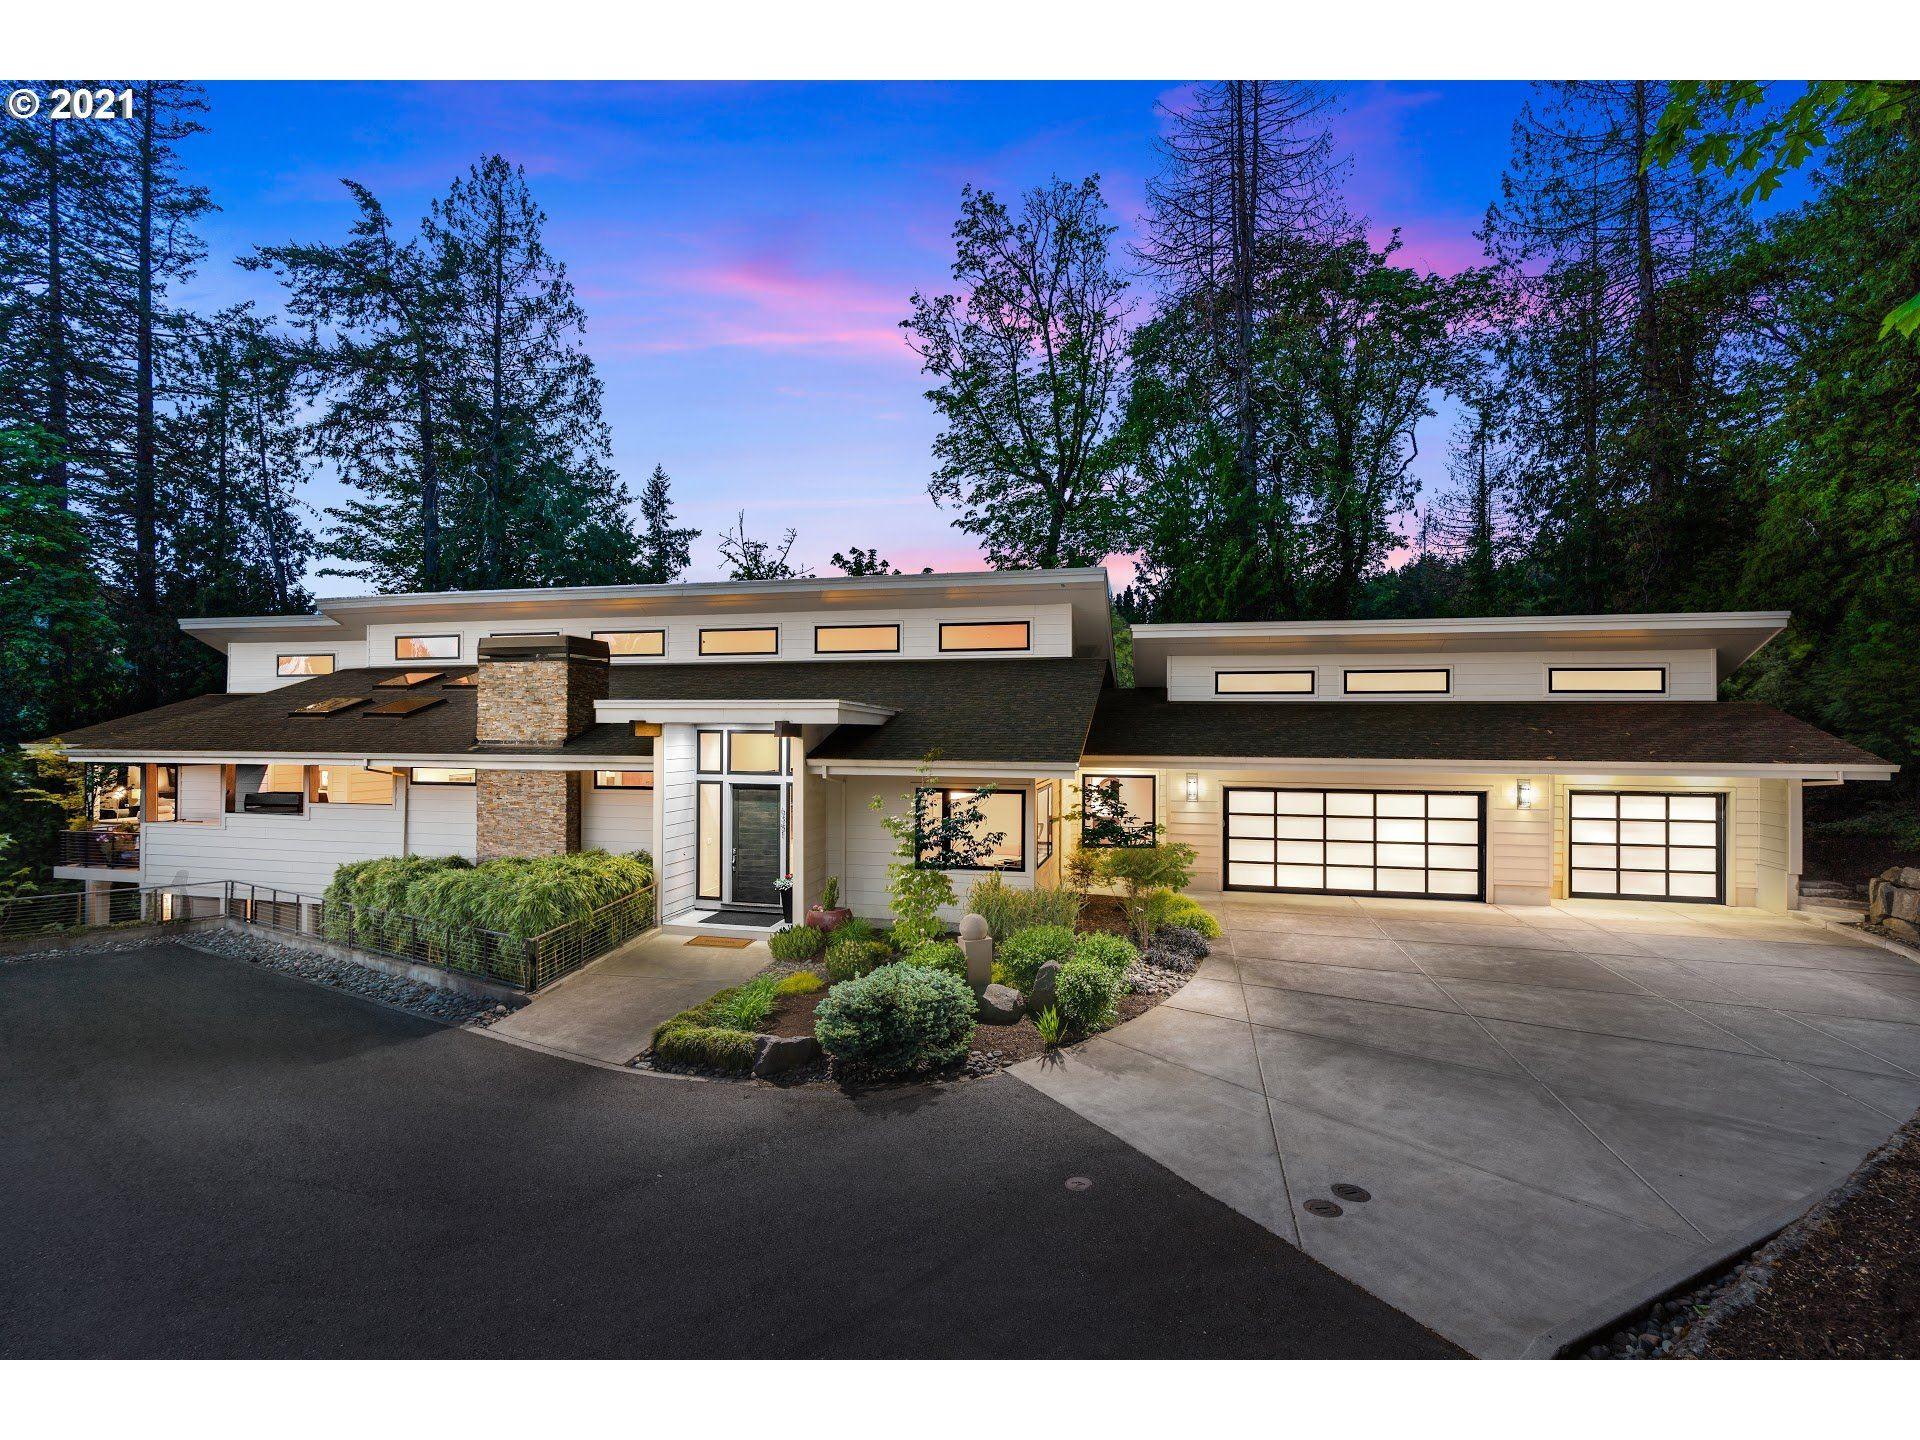 6351 SW LABER RD, Portland, OR 97221 - MLS#: 21211205